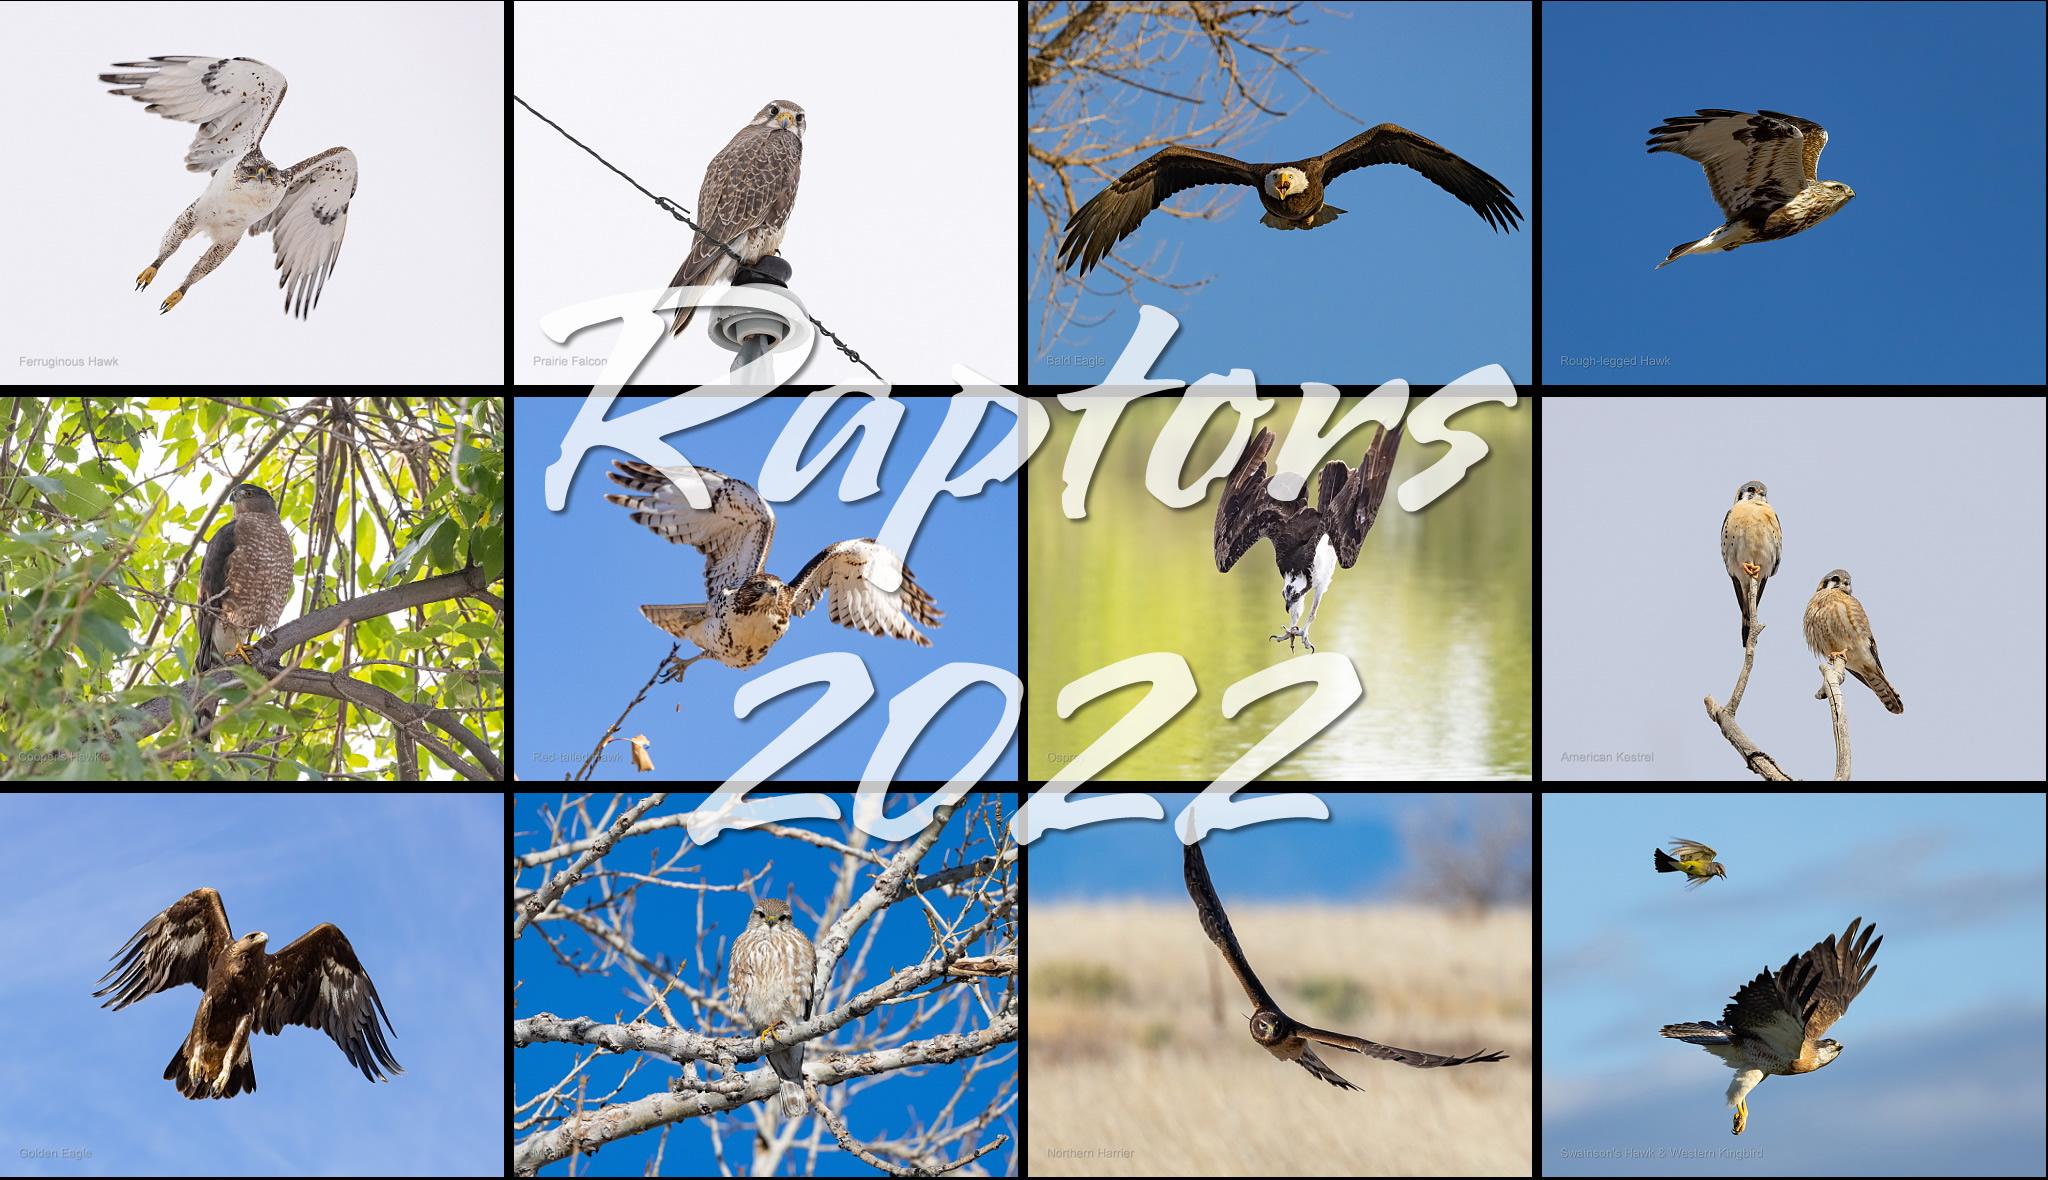 Raptors 2022 calendar